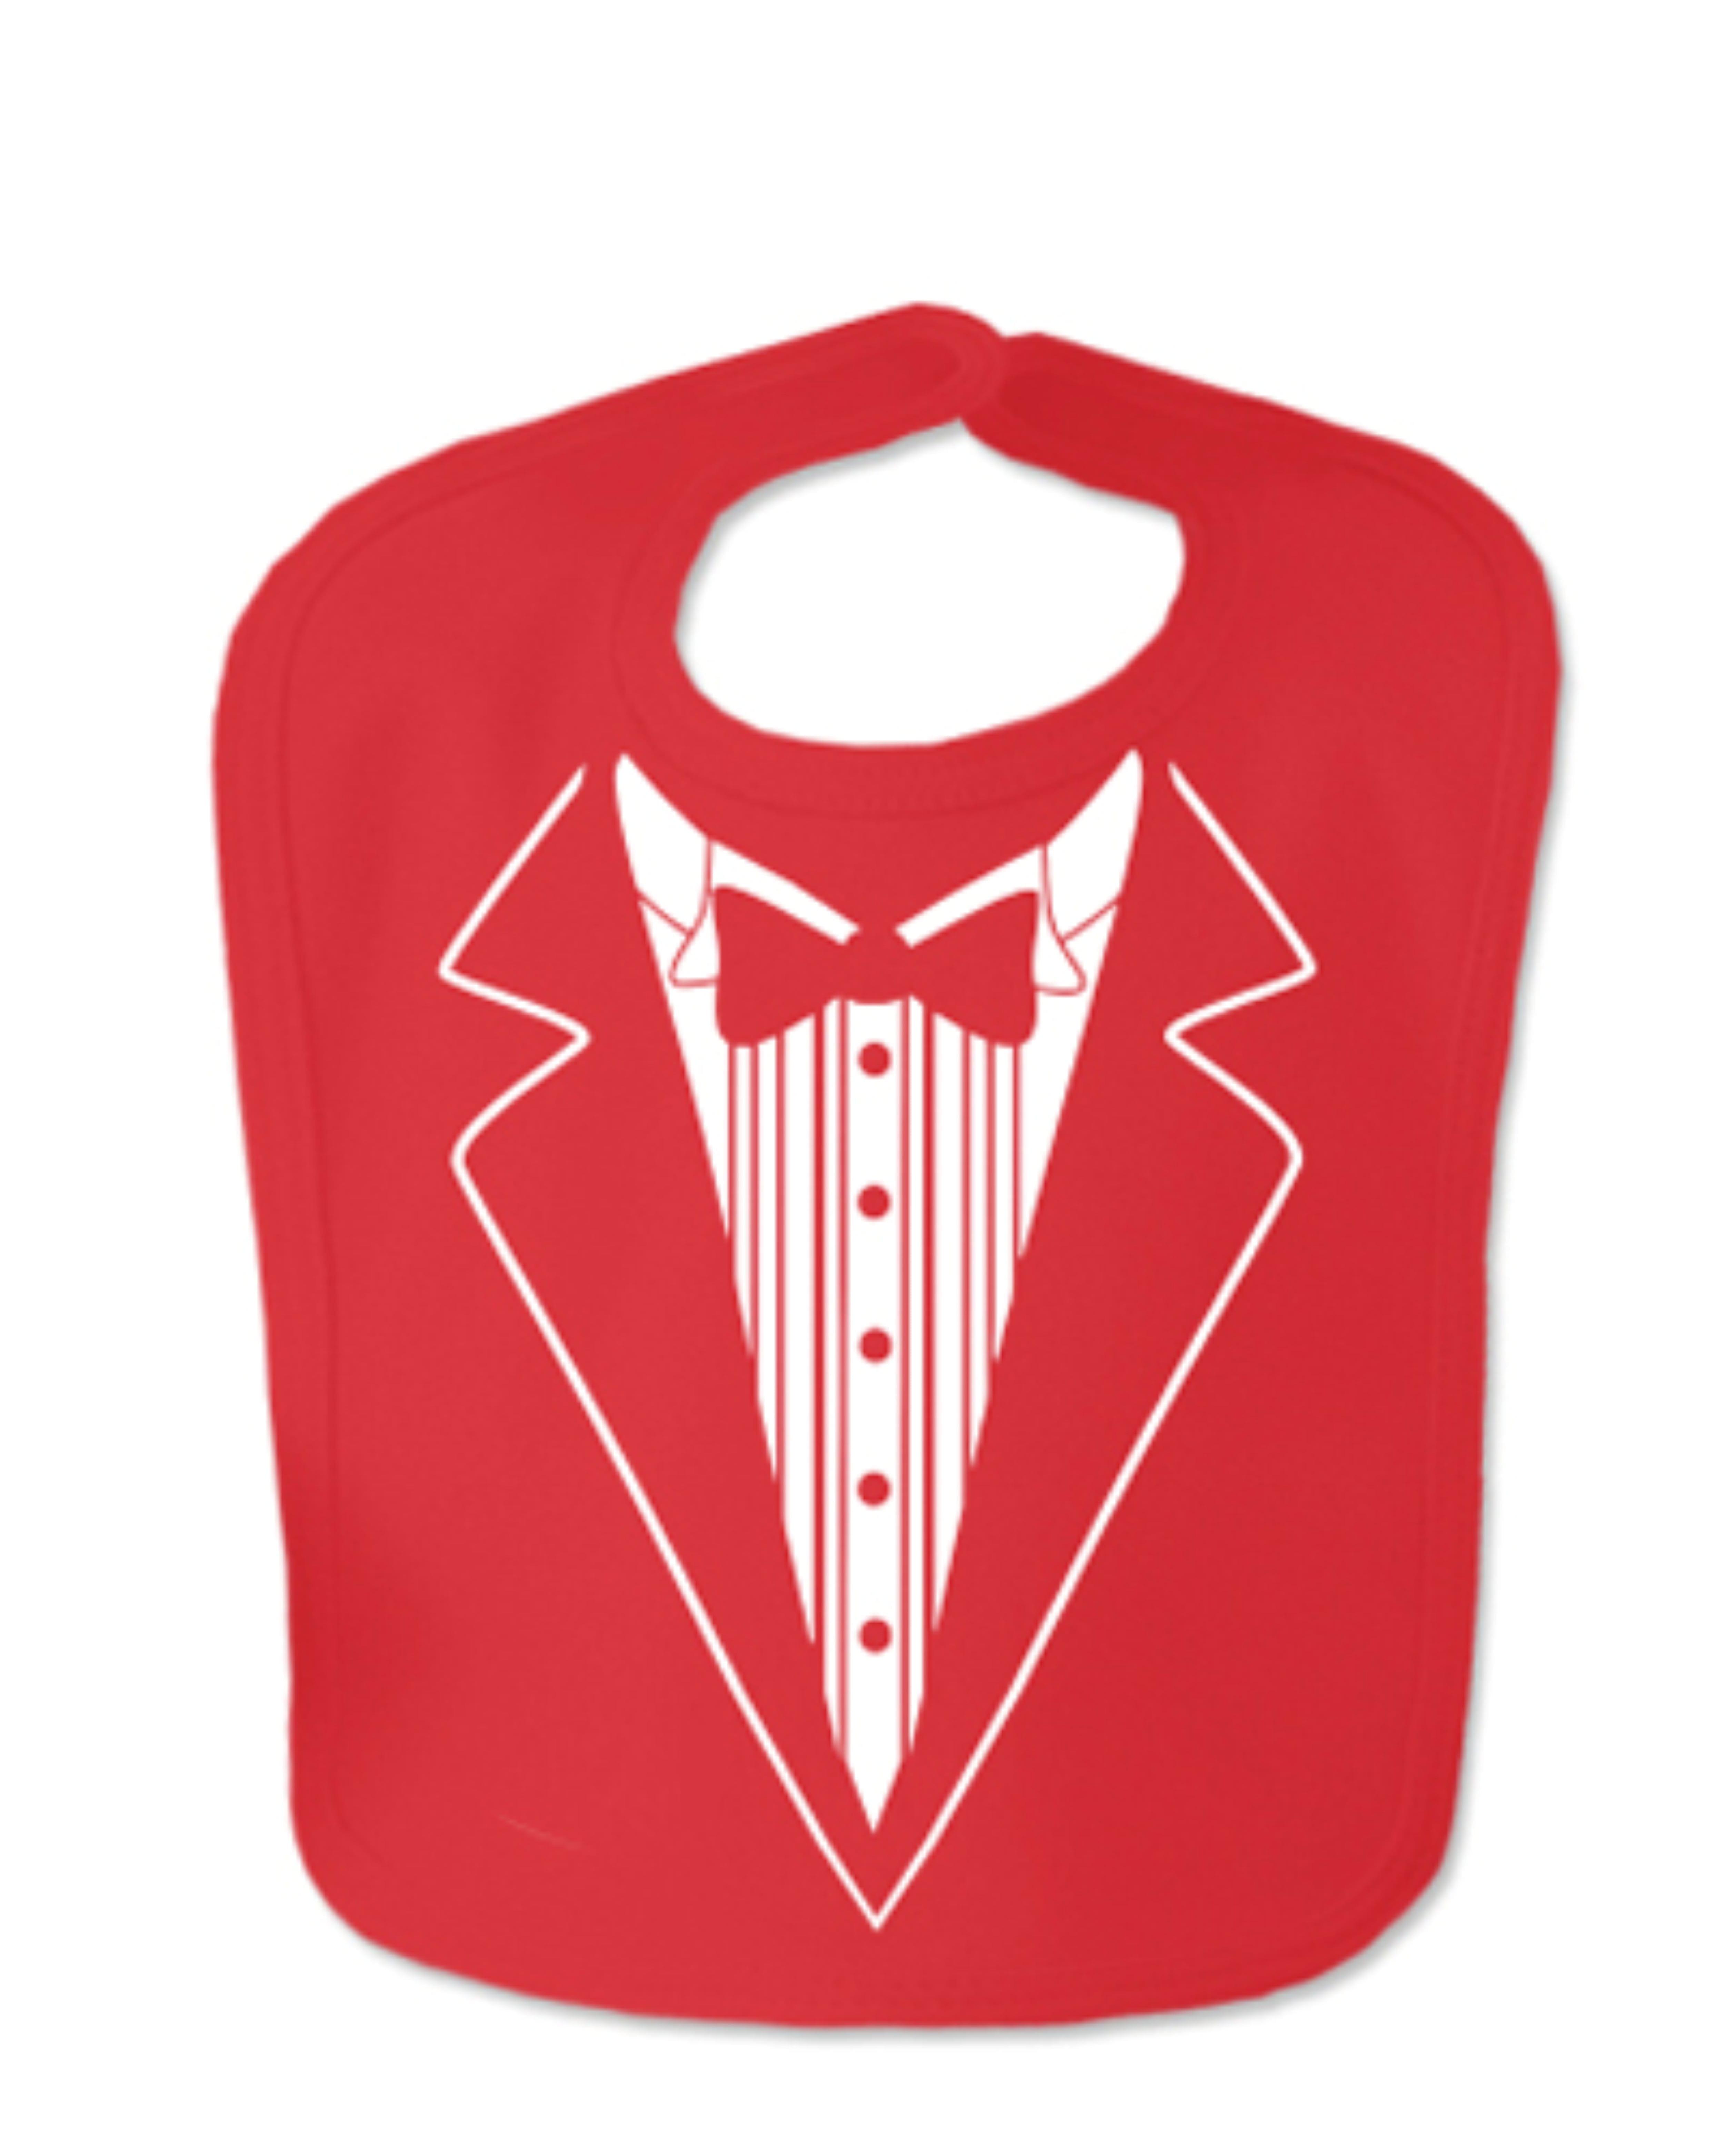 Red Tuxedo Velcro Baby Bib